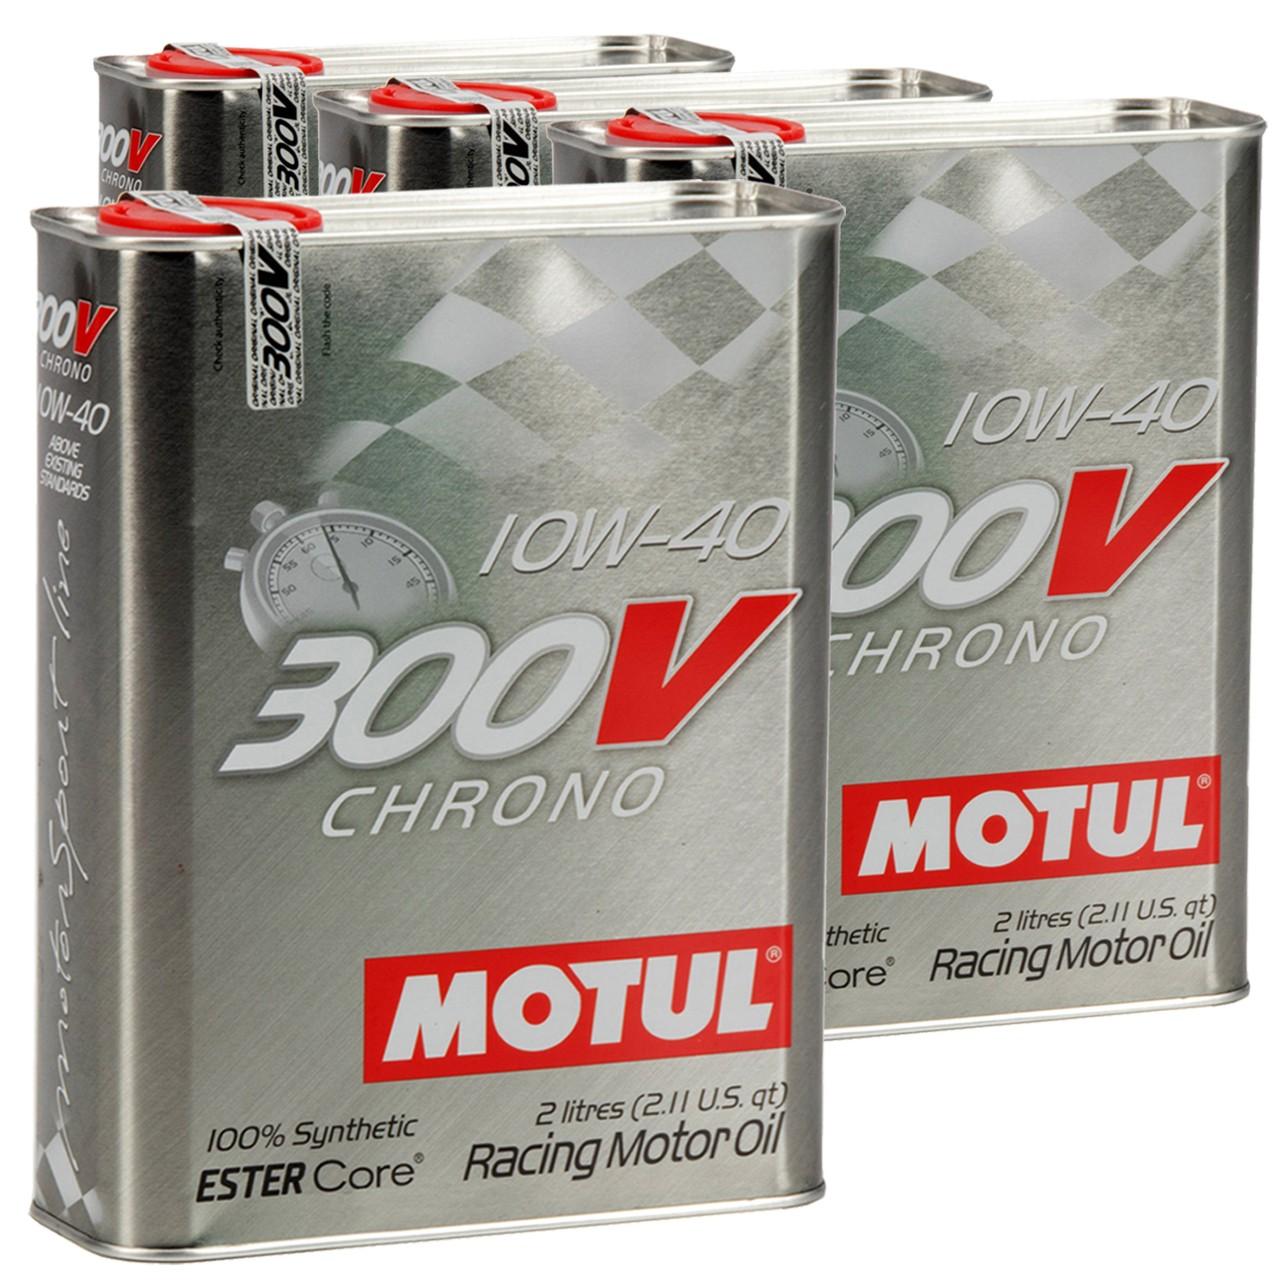 MOTUL 300V CHRONO Motoröl Öl 10W40 100% Synthetic Ester Core - 8L 8 Liter